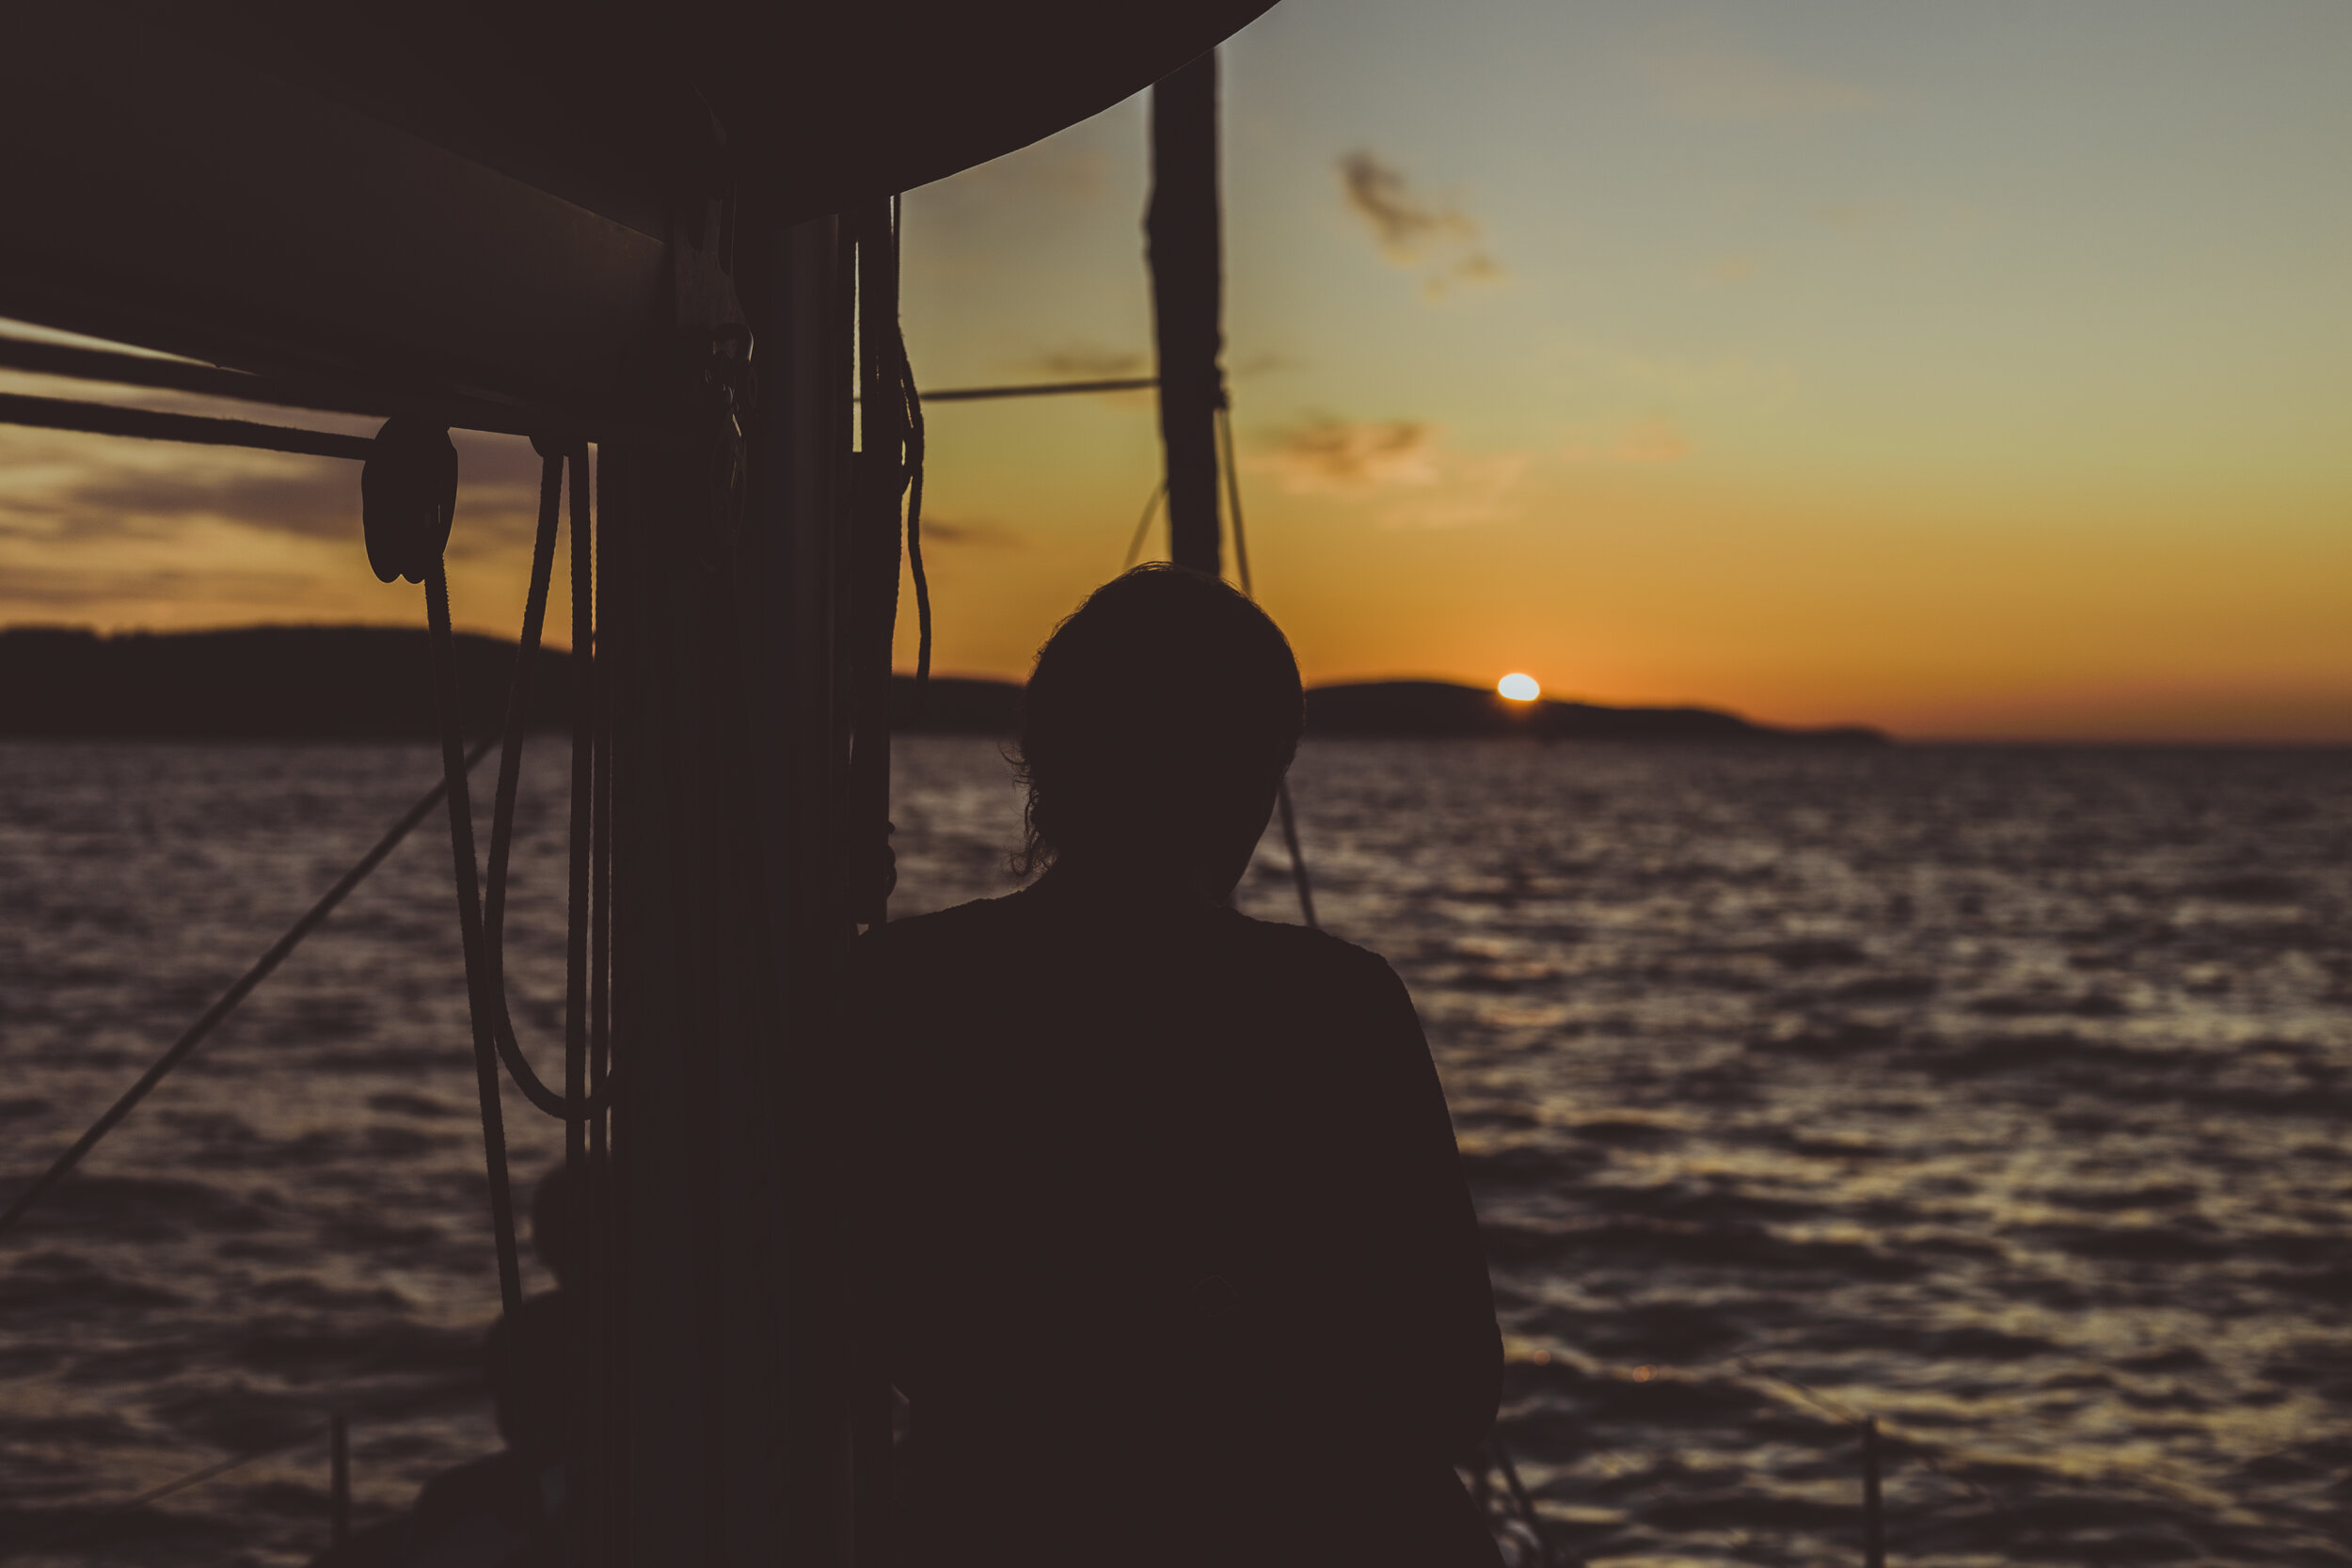 Greece sunset, london school of sailing - carrick mclelland